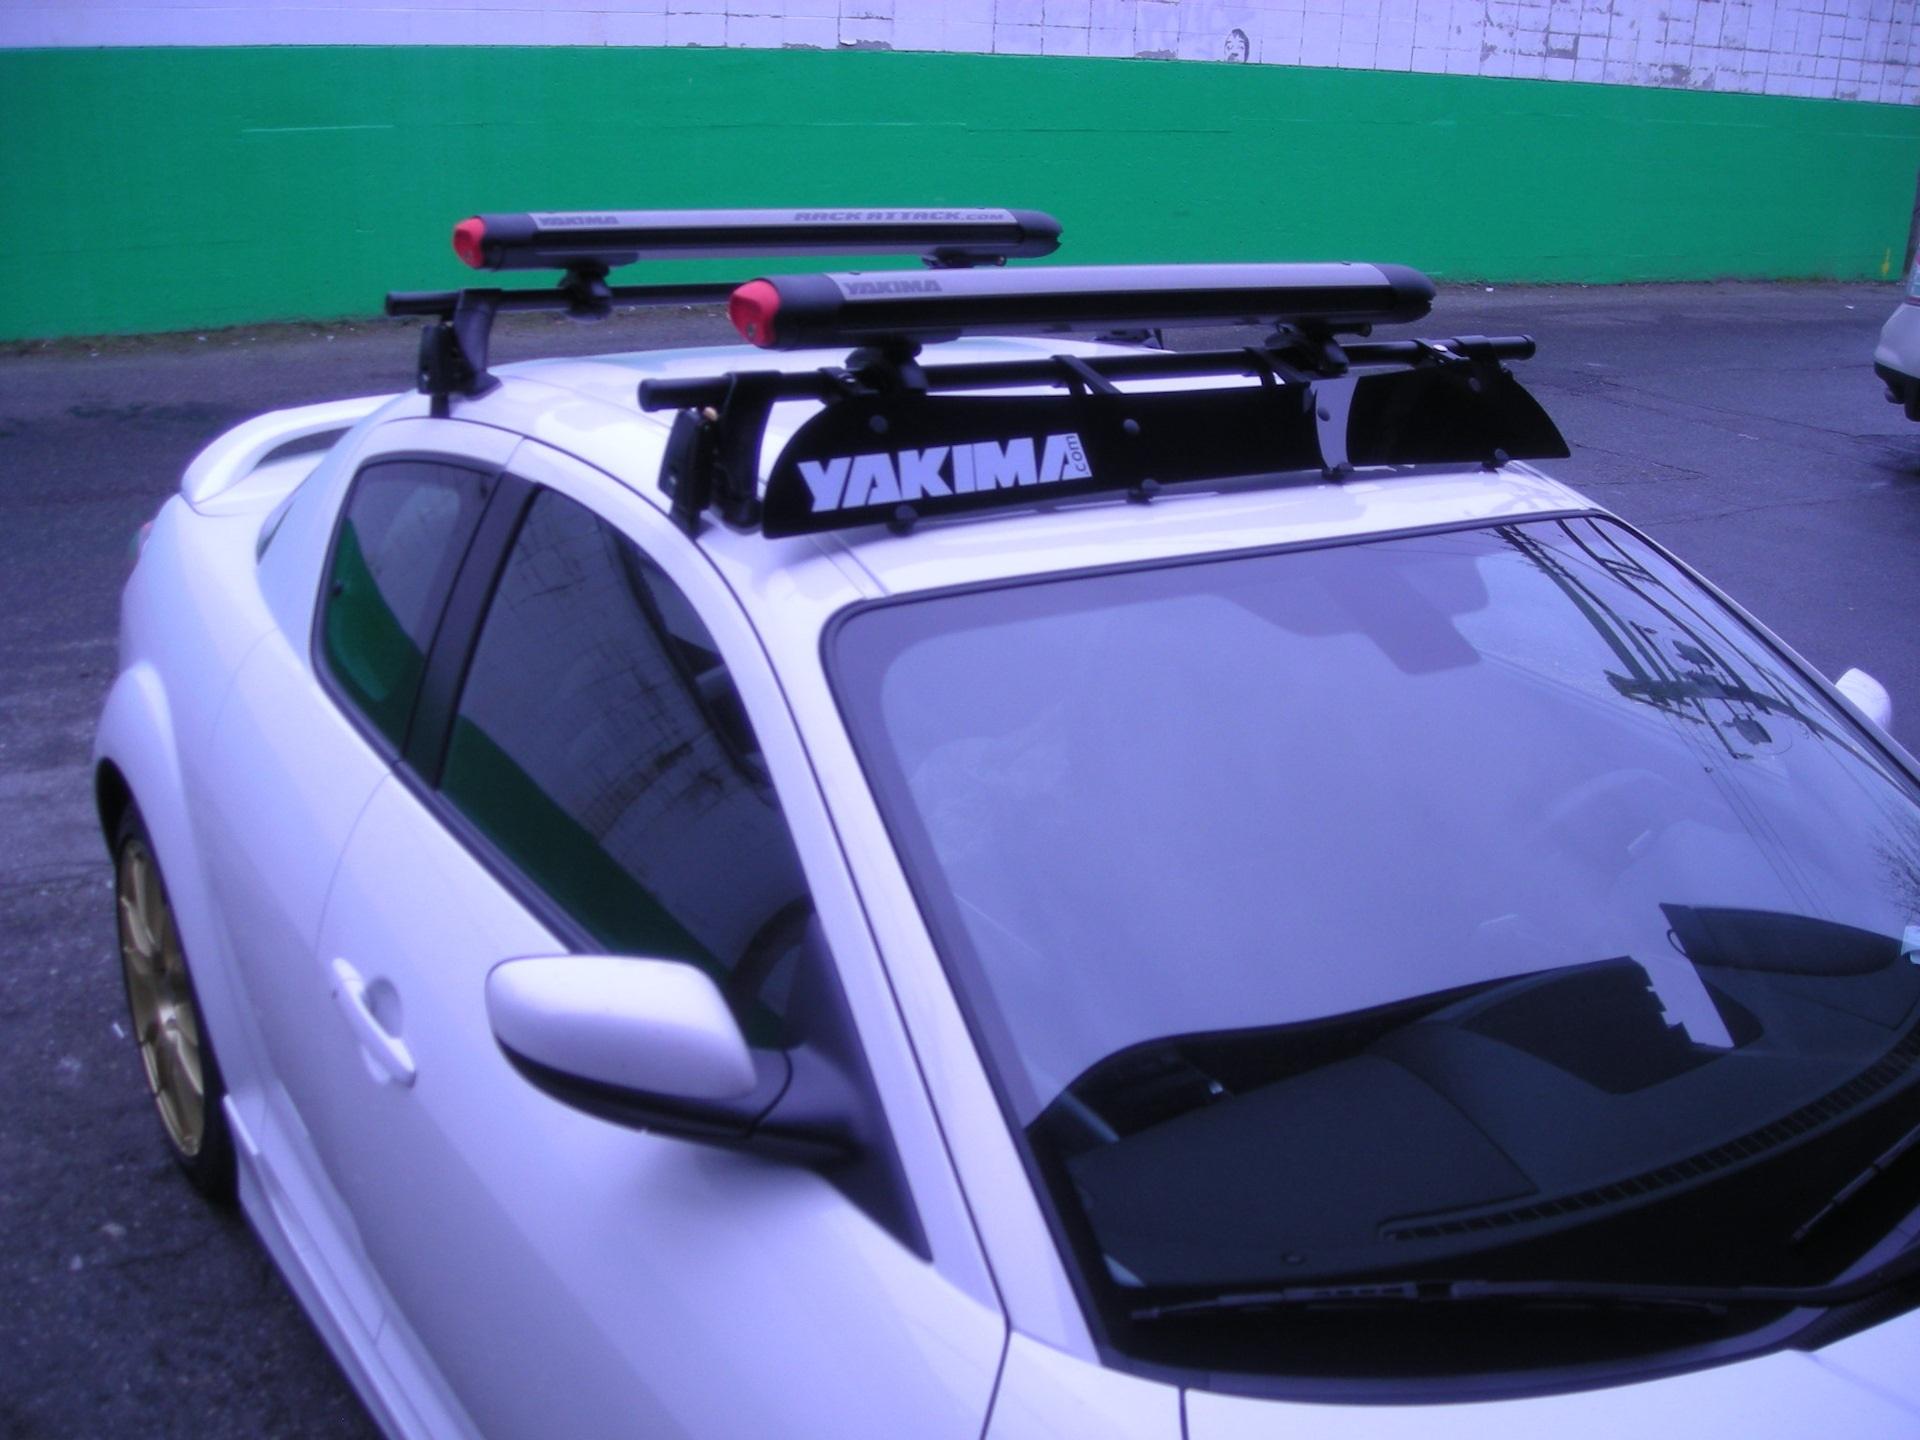 Багажник на крышу автомобиля компании Yakima